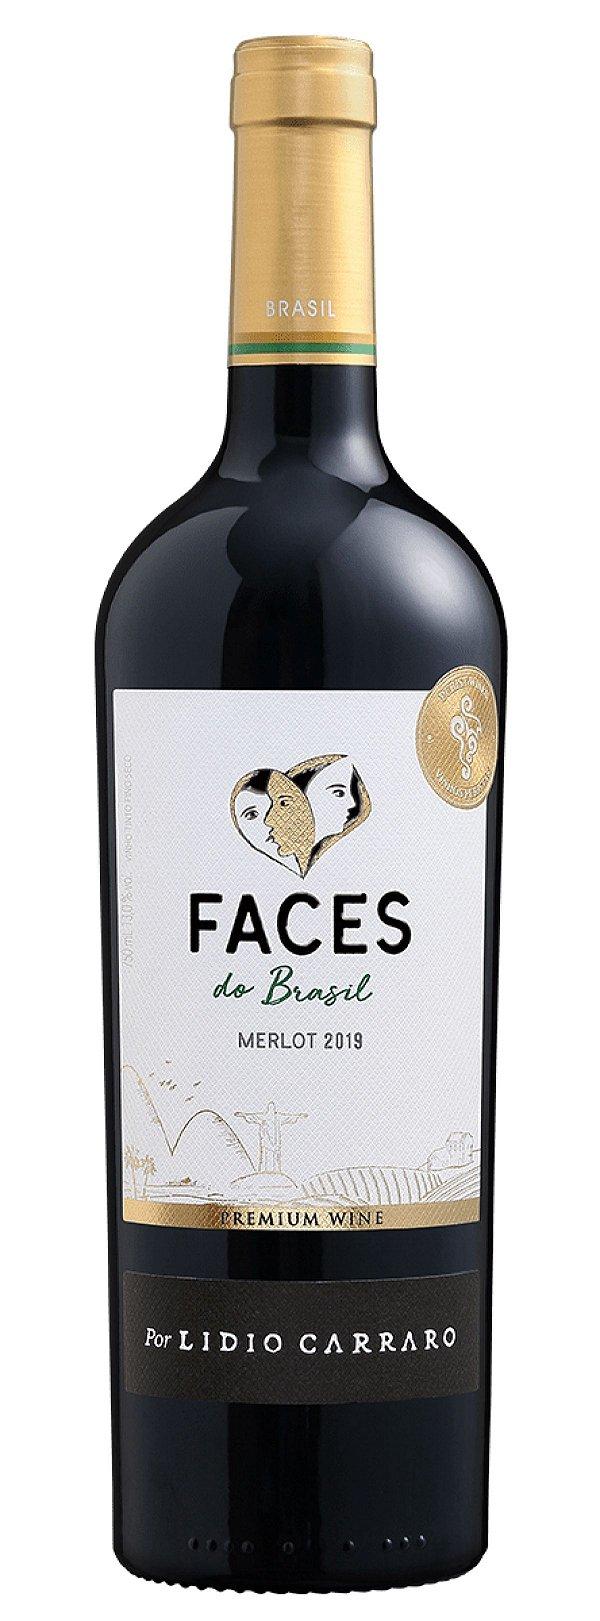 Vinho tinto Merlot Faces do Brasil Lídio Carraro